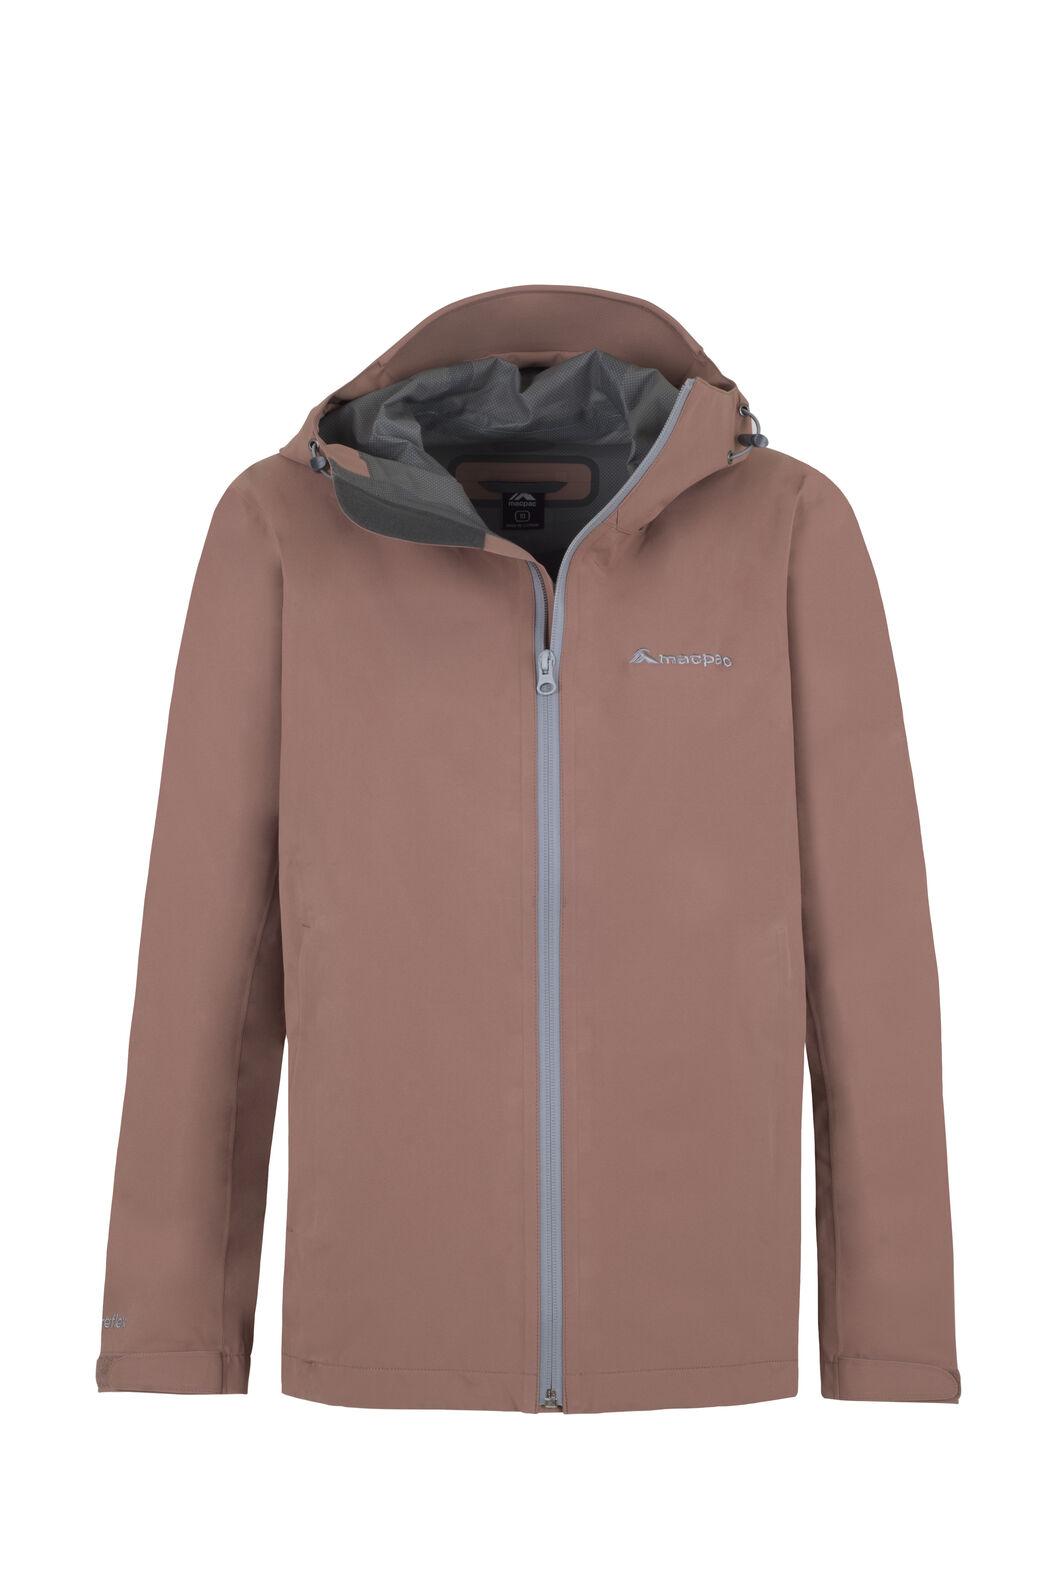 Macpac Dispatch Rain Jacket - Women's, Burlwood, hi-res